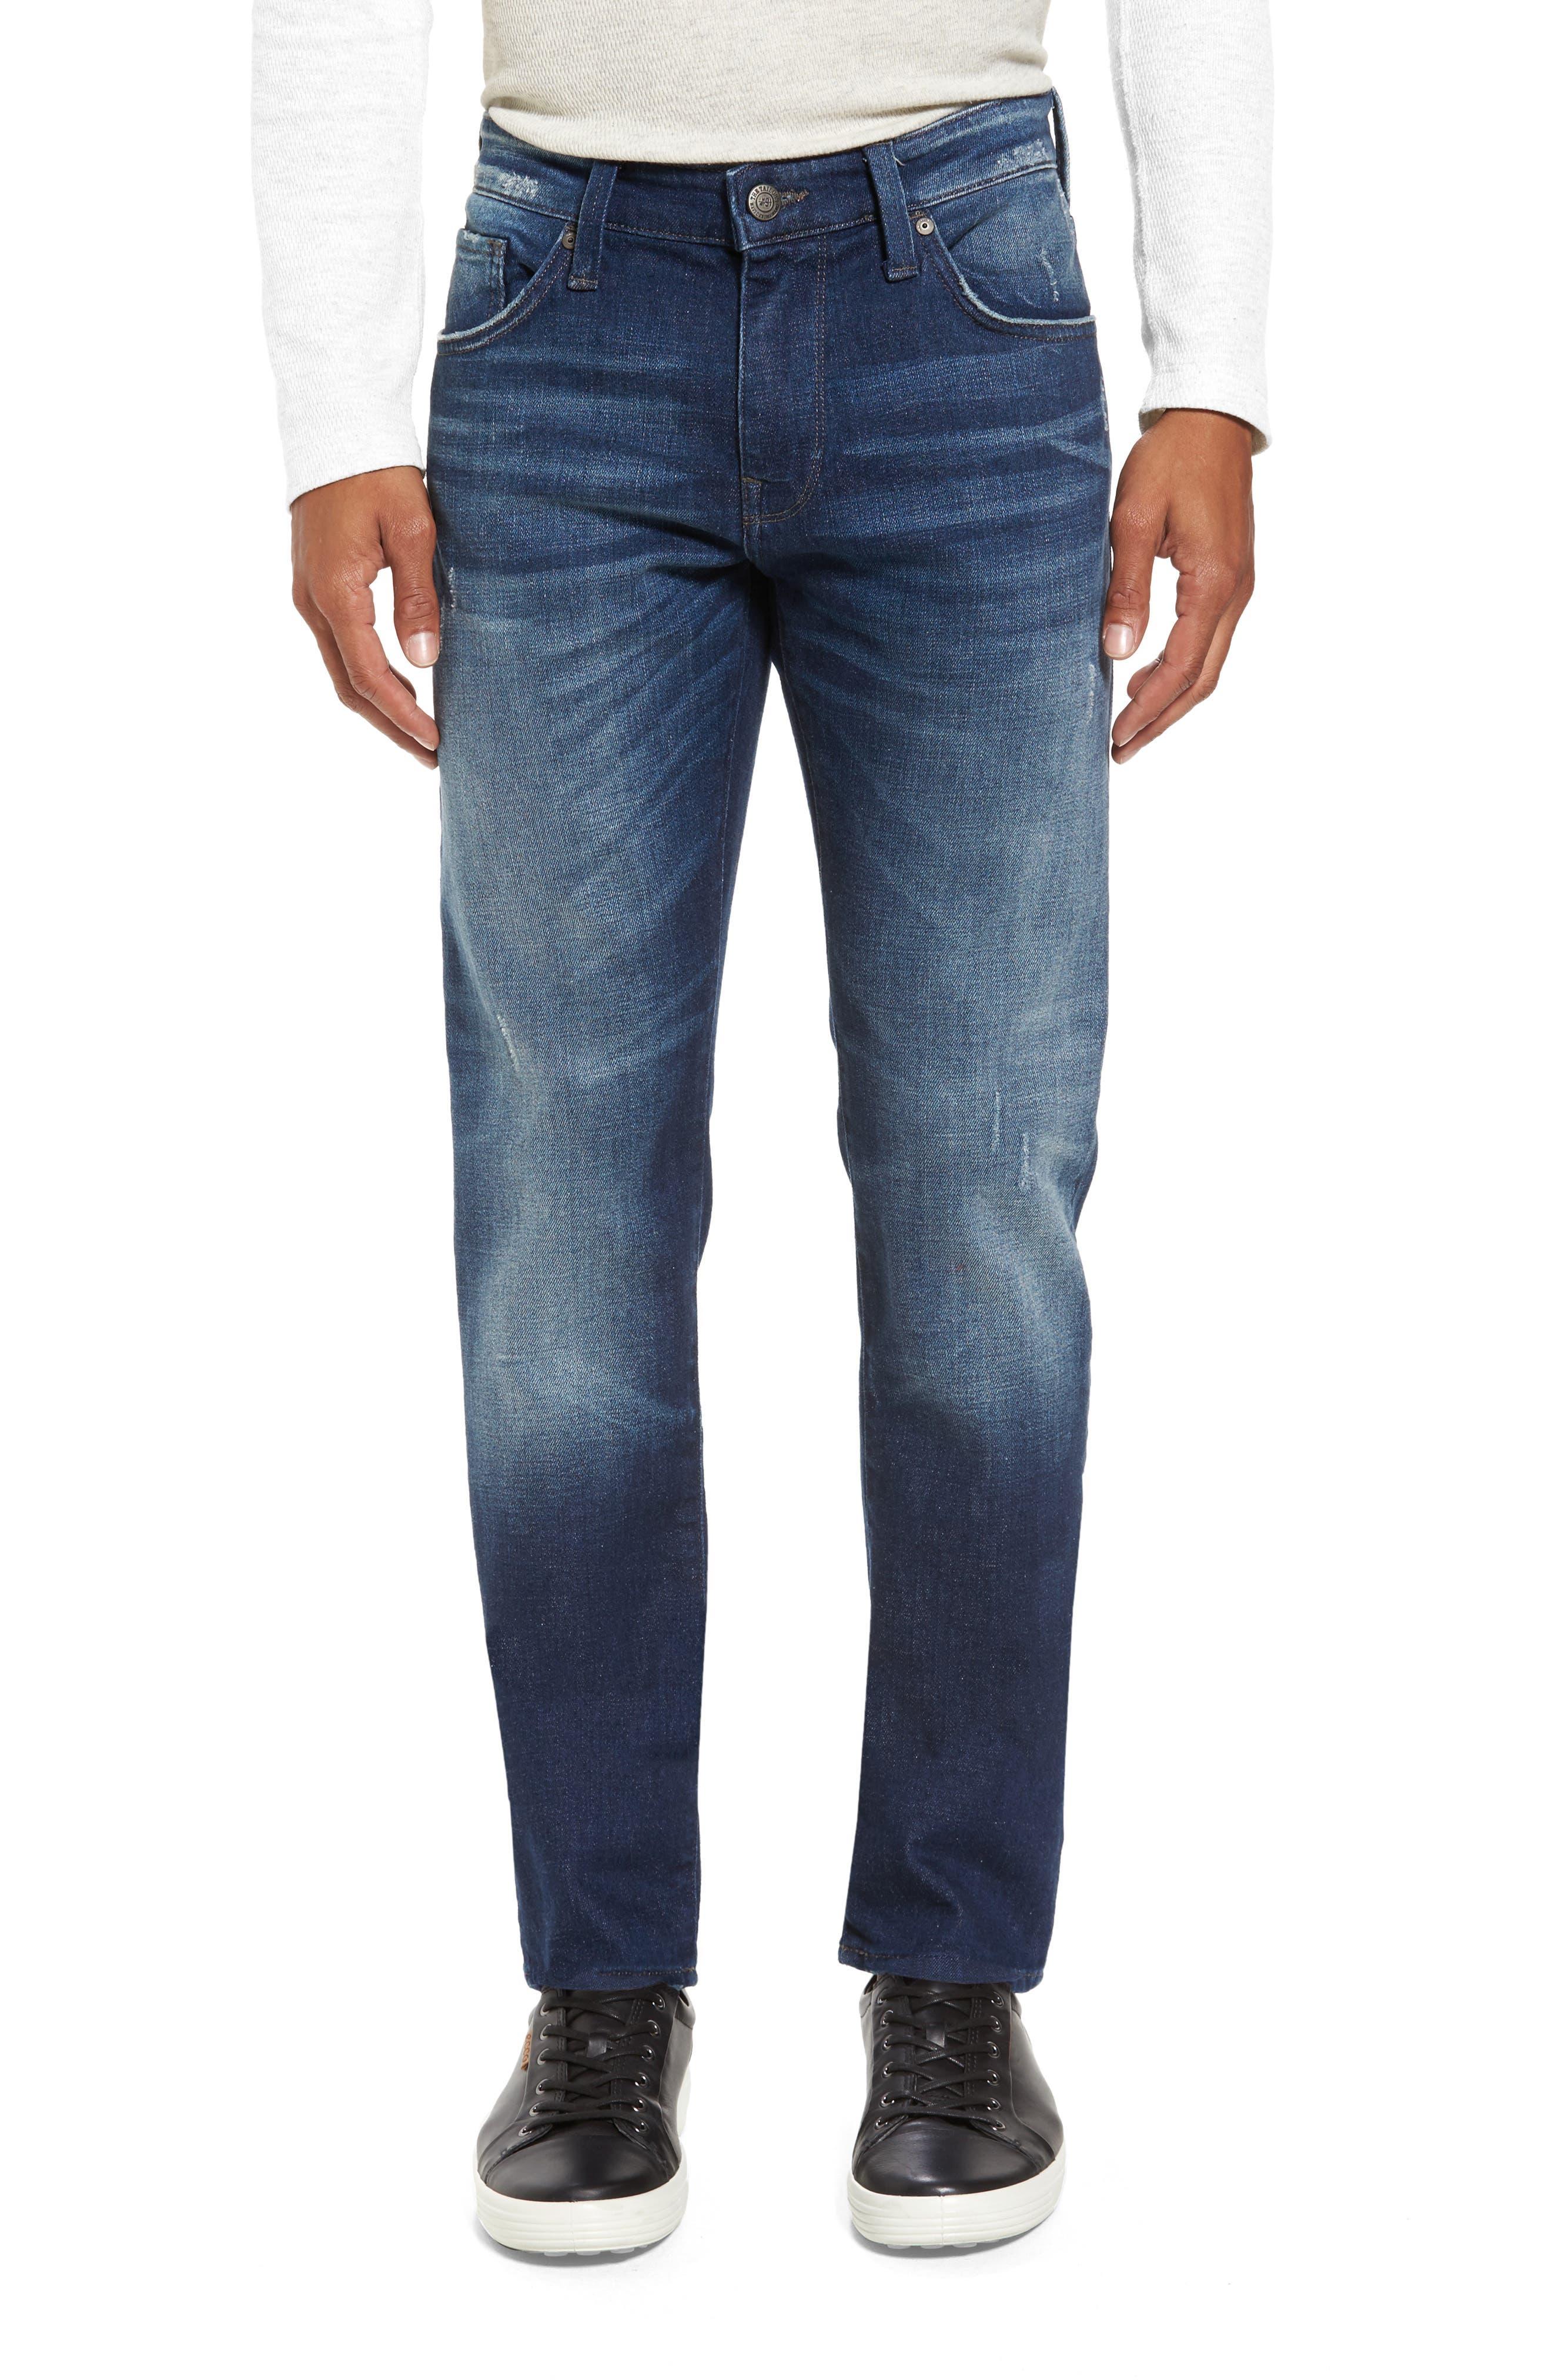 Jake Easy Slim Fit Jeans,                             Main thumbnail 1, color,                             401